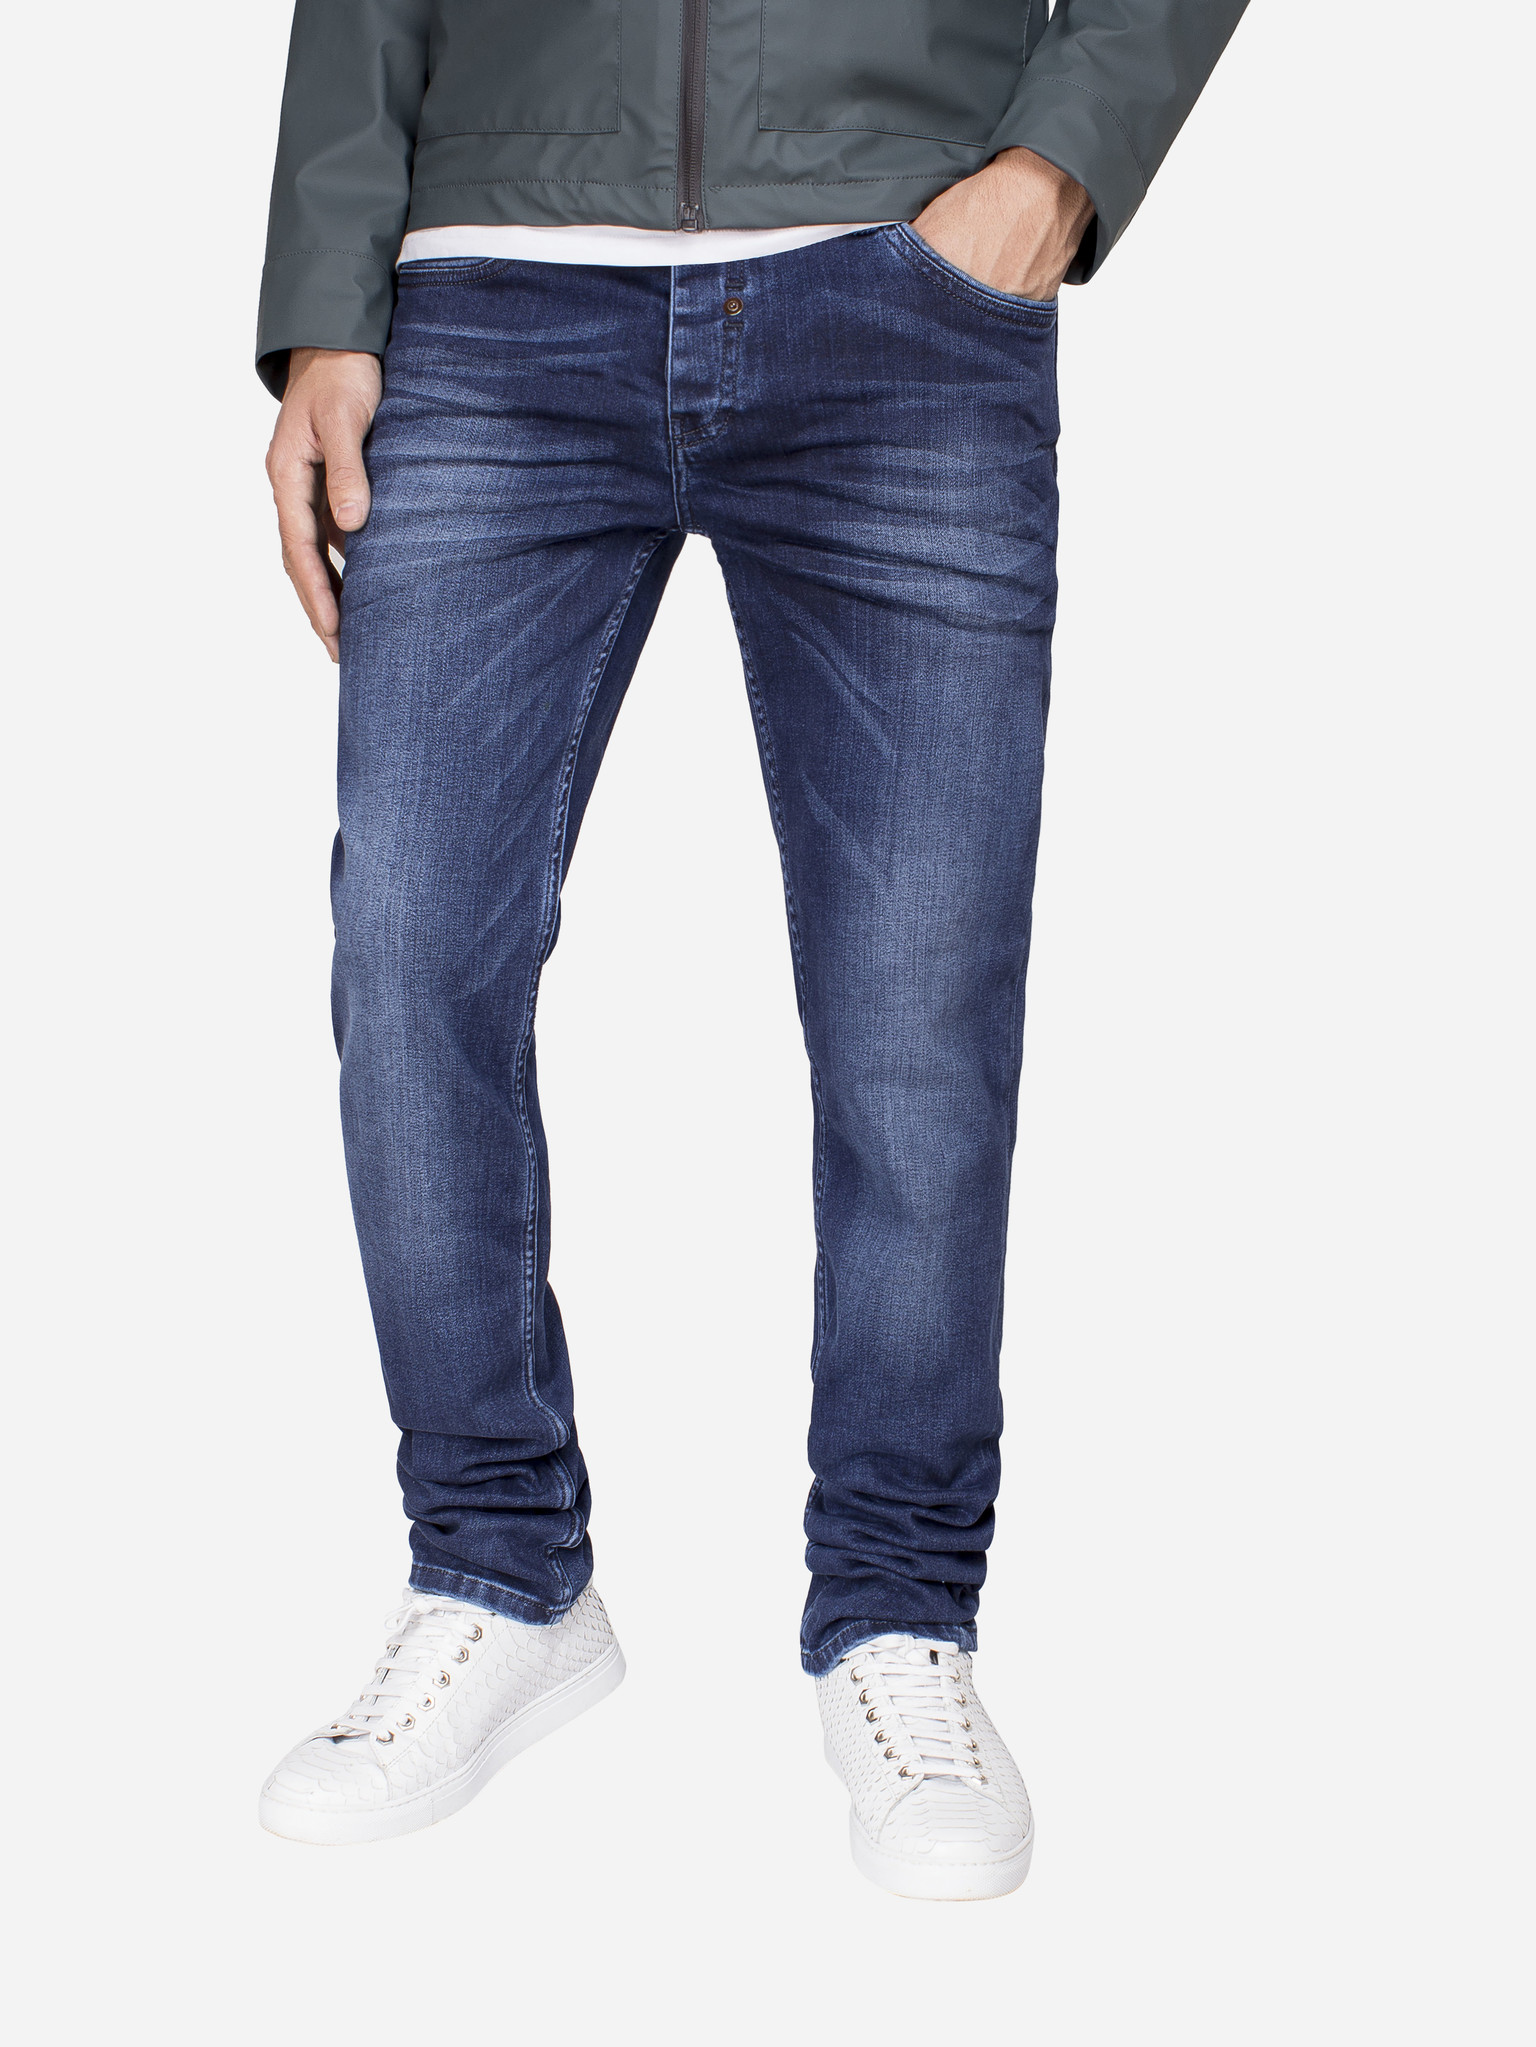 Wam Denim Jeans  Maat: 33/34